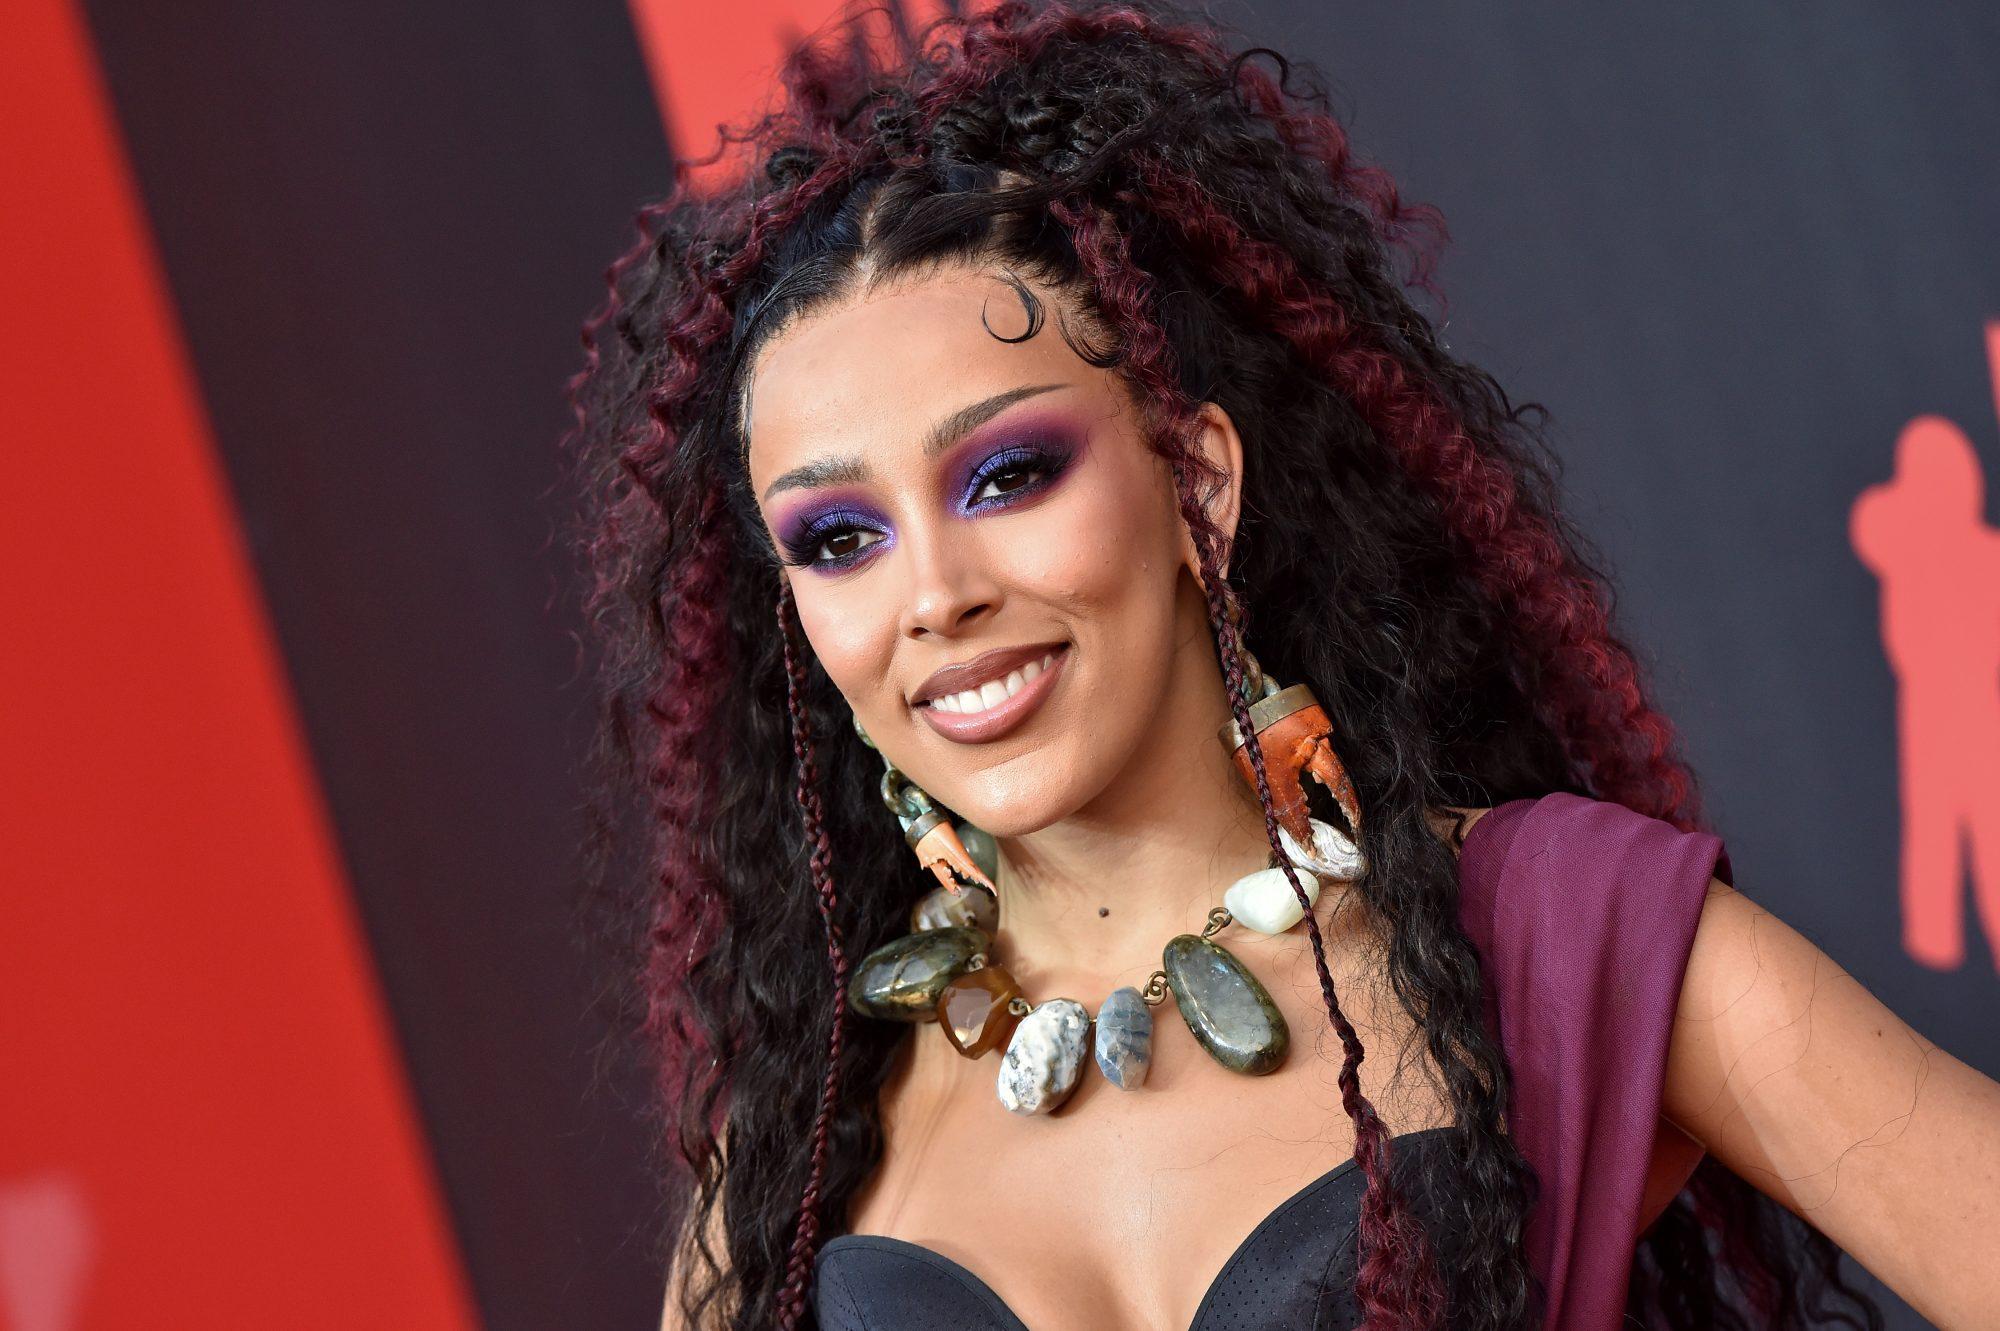 MTV VMA looks del belleza, Doja Cat